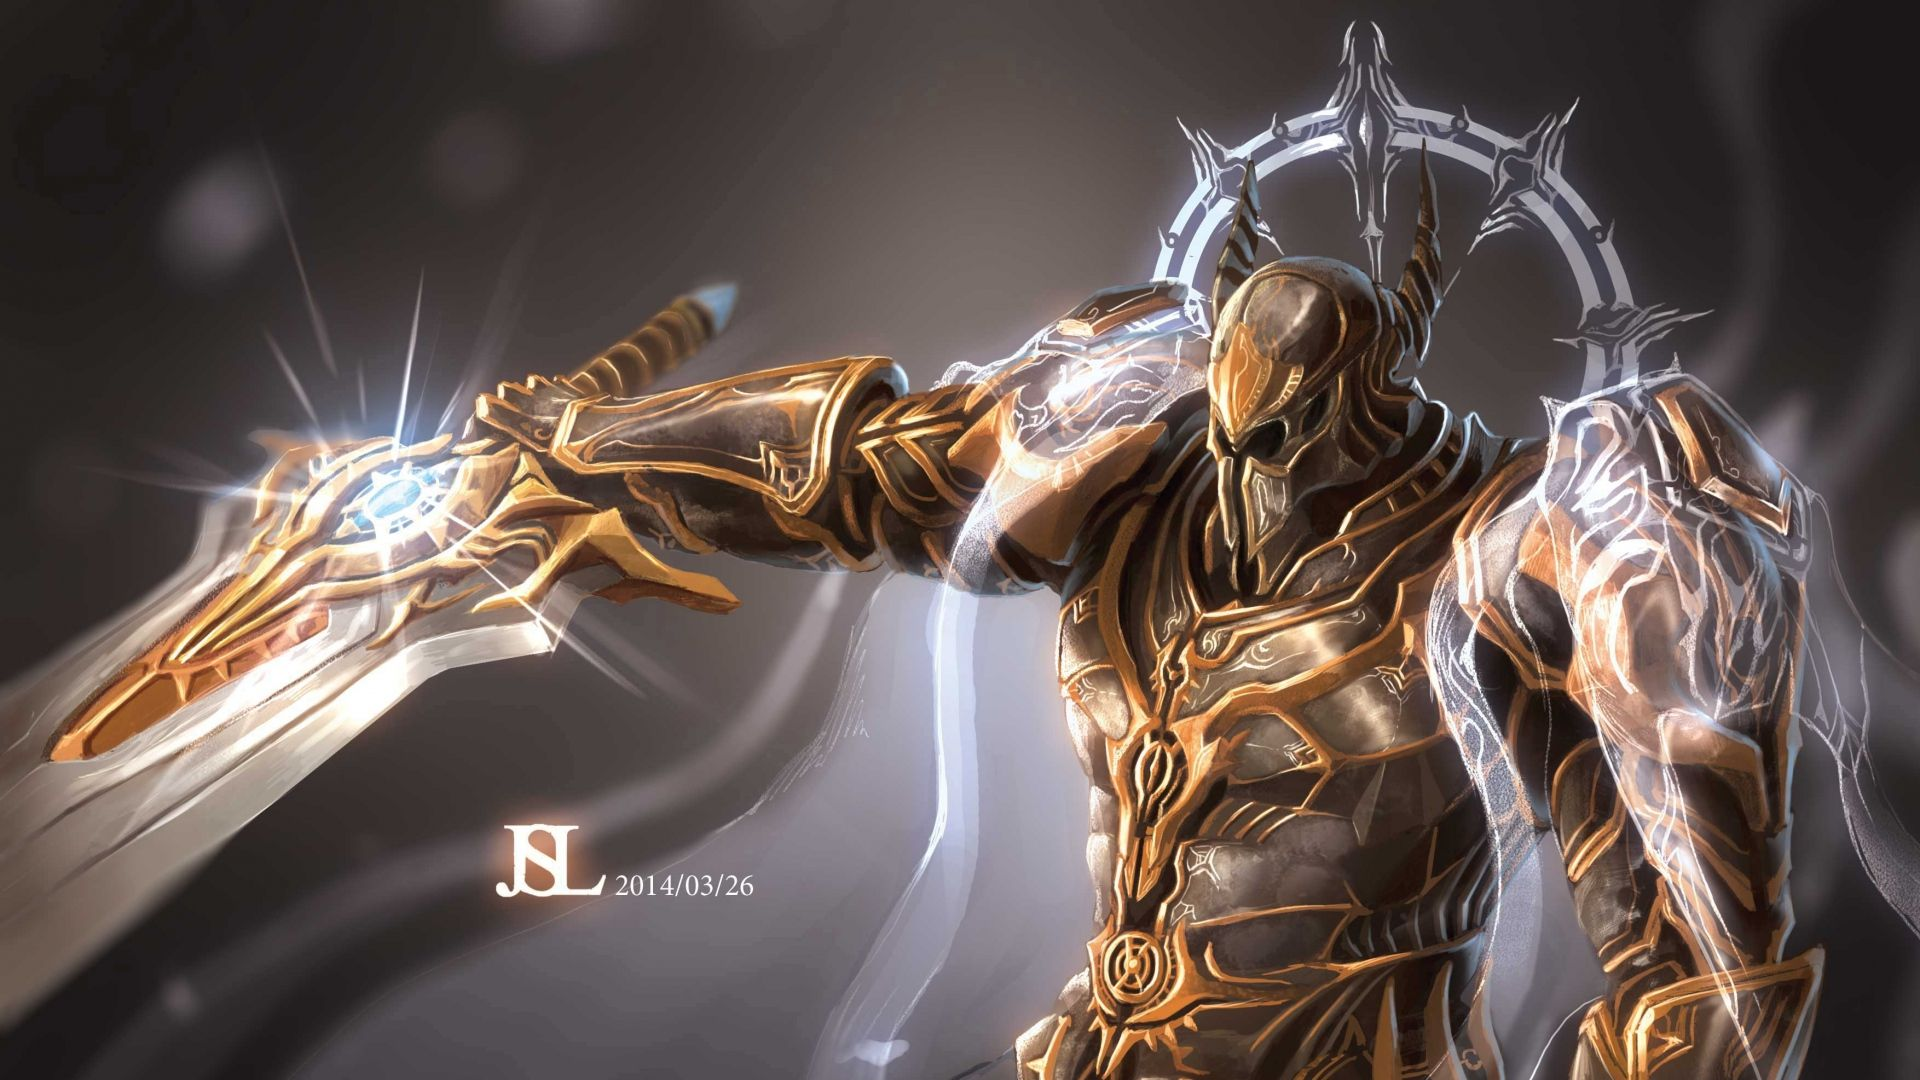 Download Wallpaper 1920x1080 Diablo 3 Diablo Archangel Armor